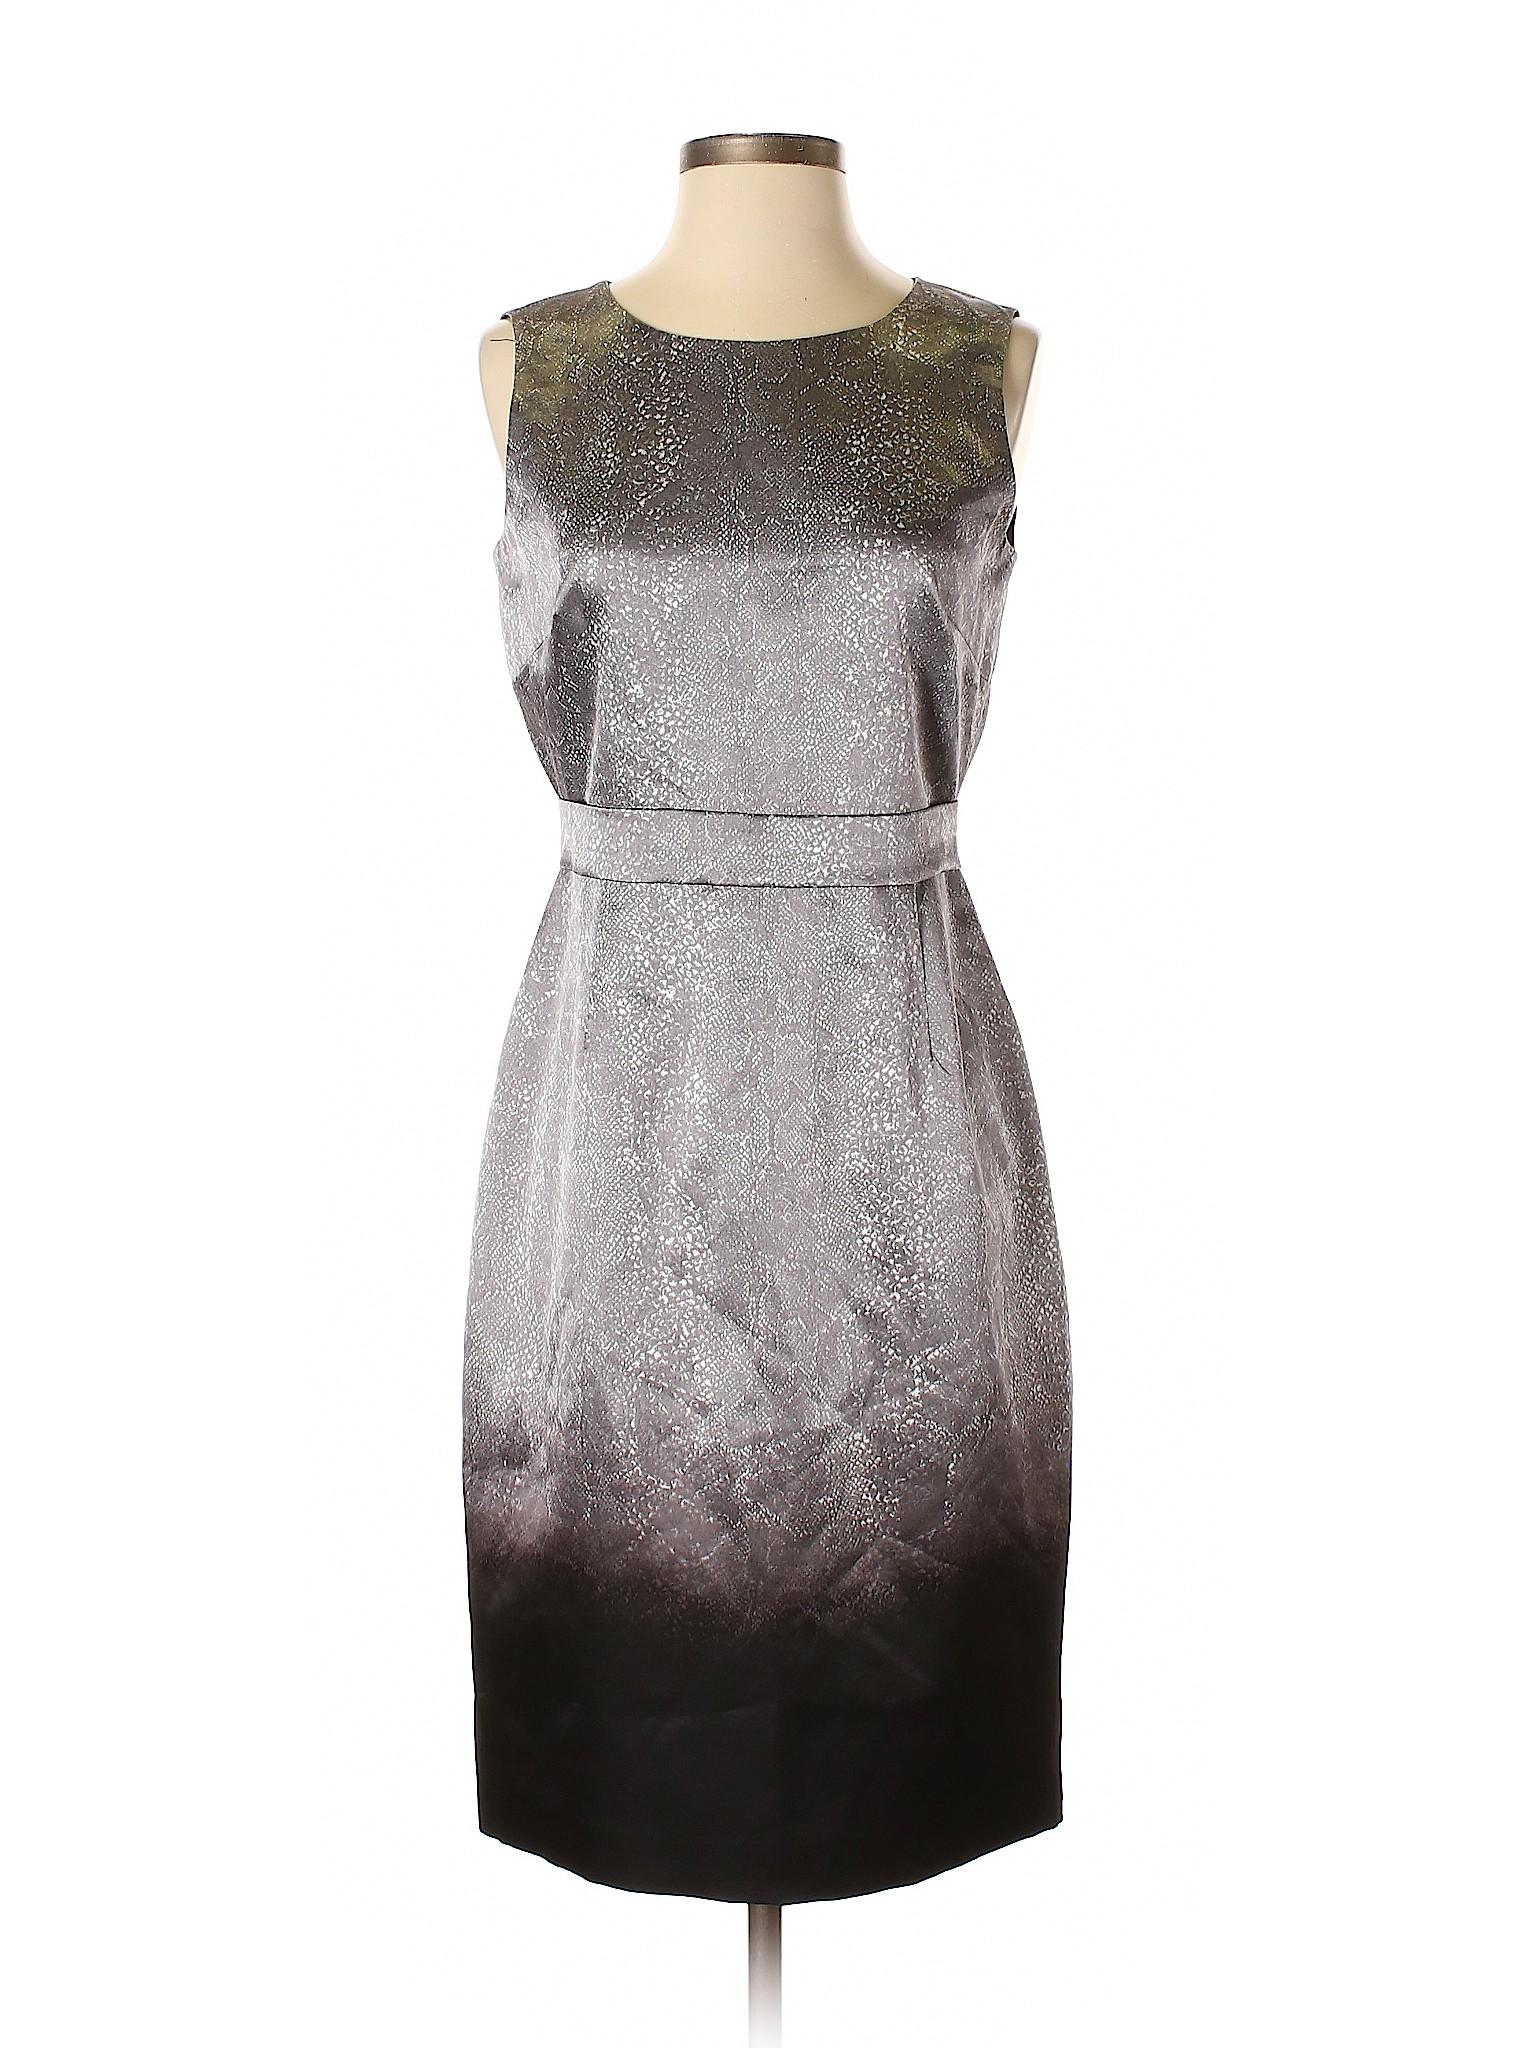 Casual winter Casual Boutique Tahari Dress Tahari winter Dress Boutique Boutique 6xaO18nn